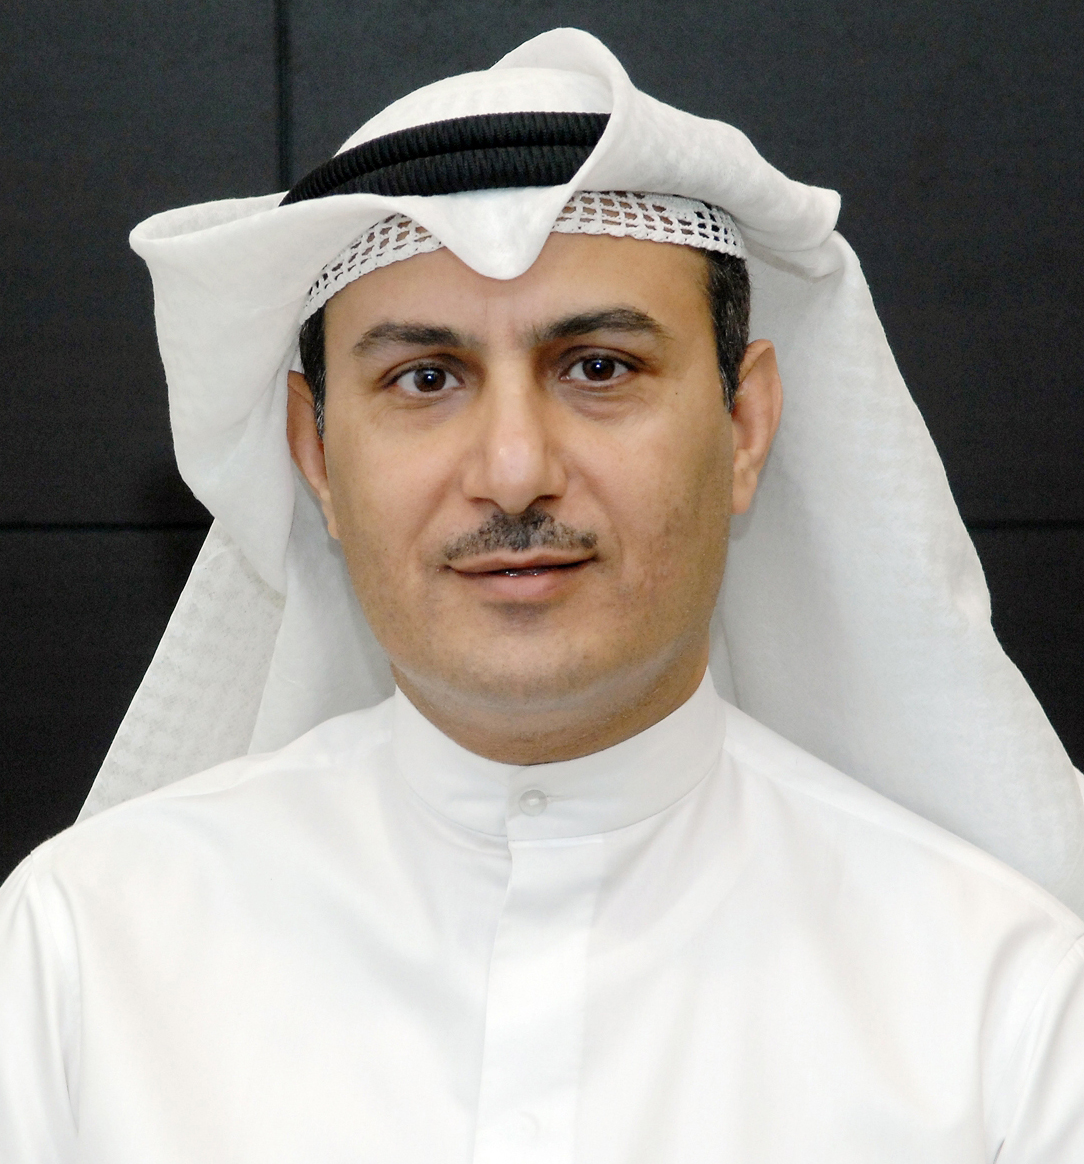 Mr Ahmad Meshari QIB Acting CEO Offical Photo Small